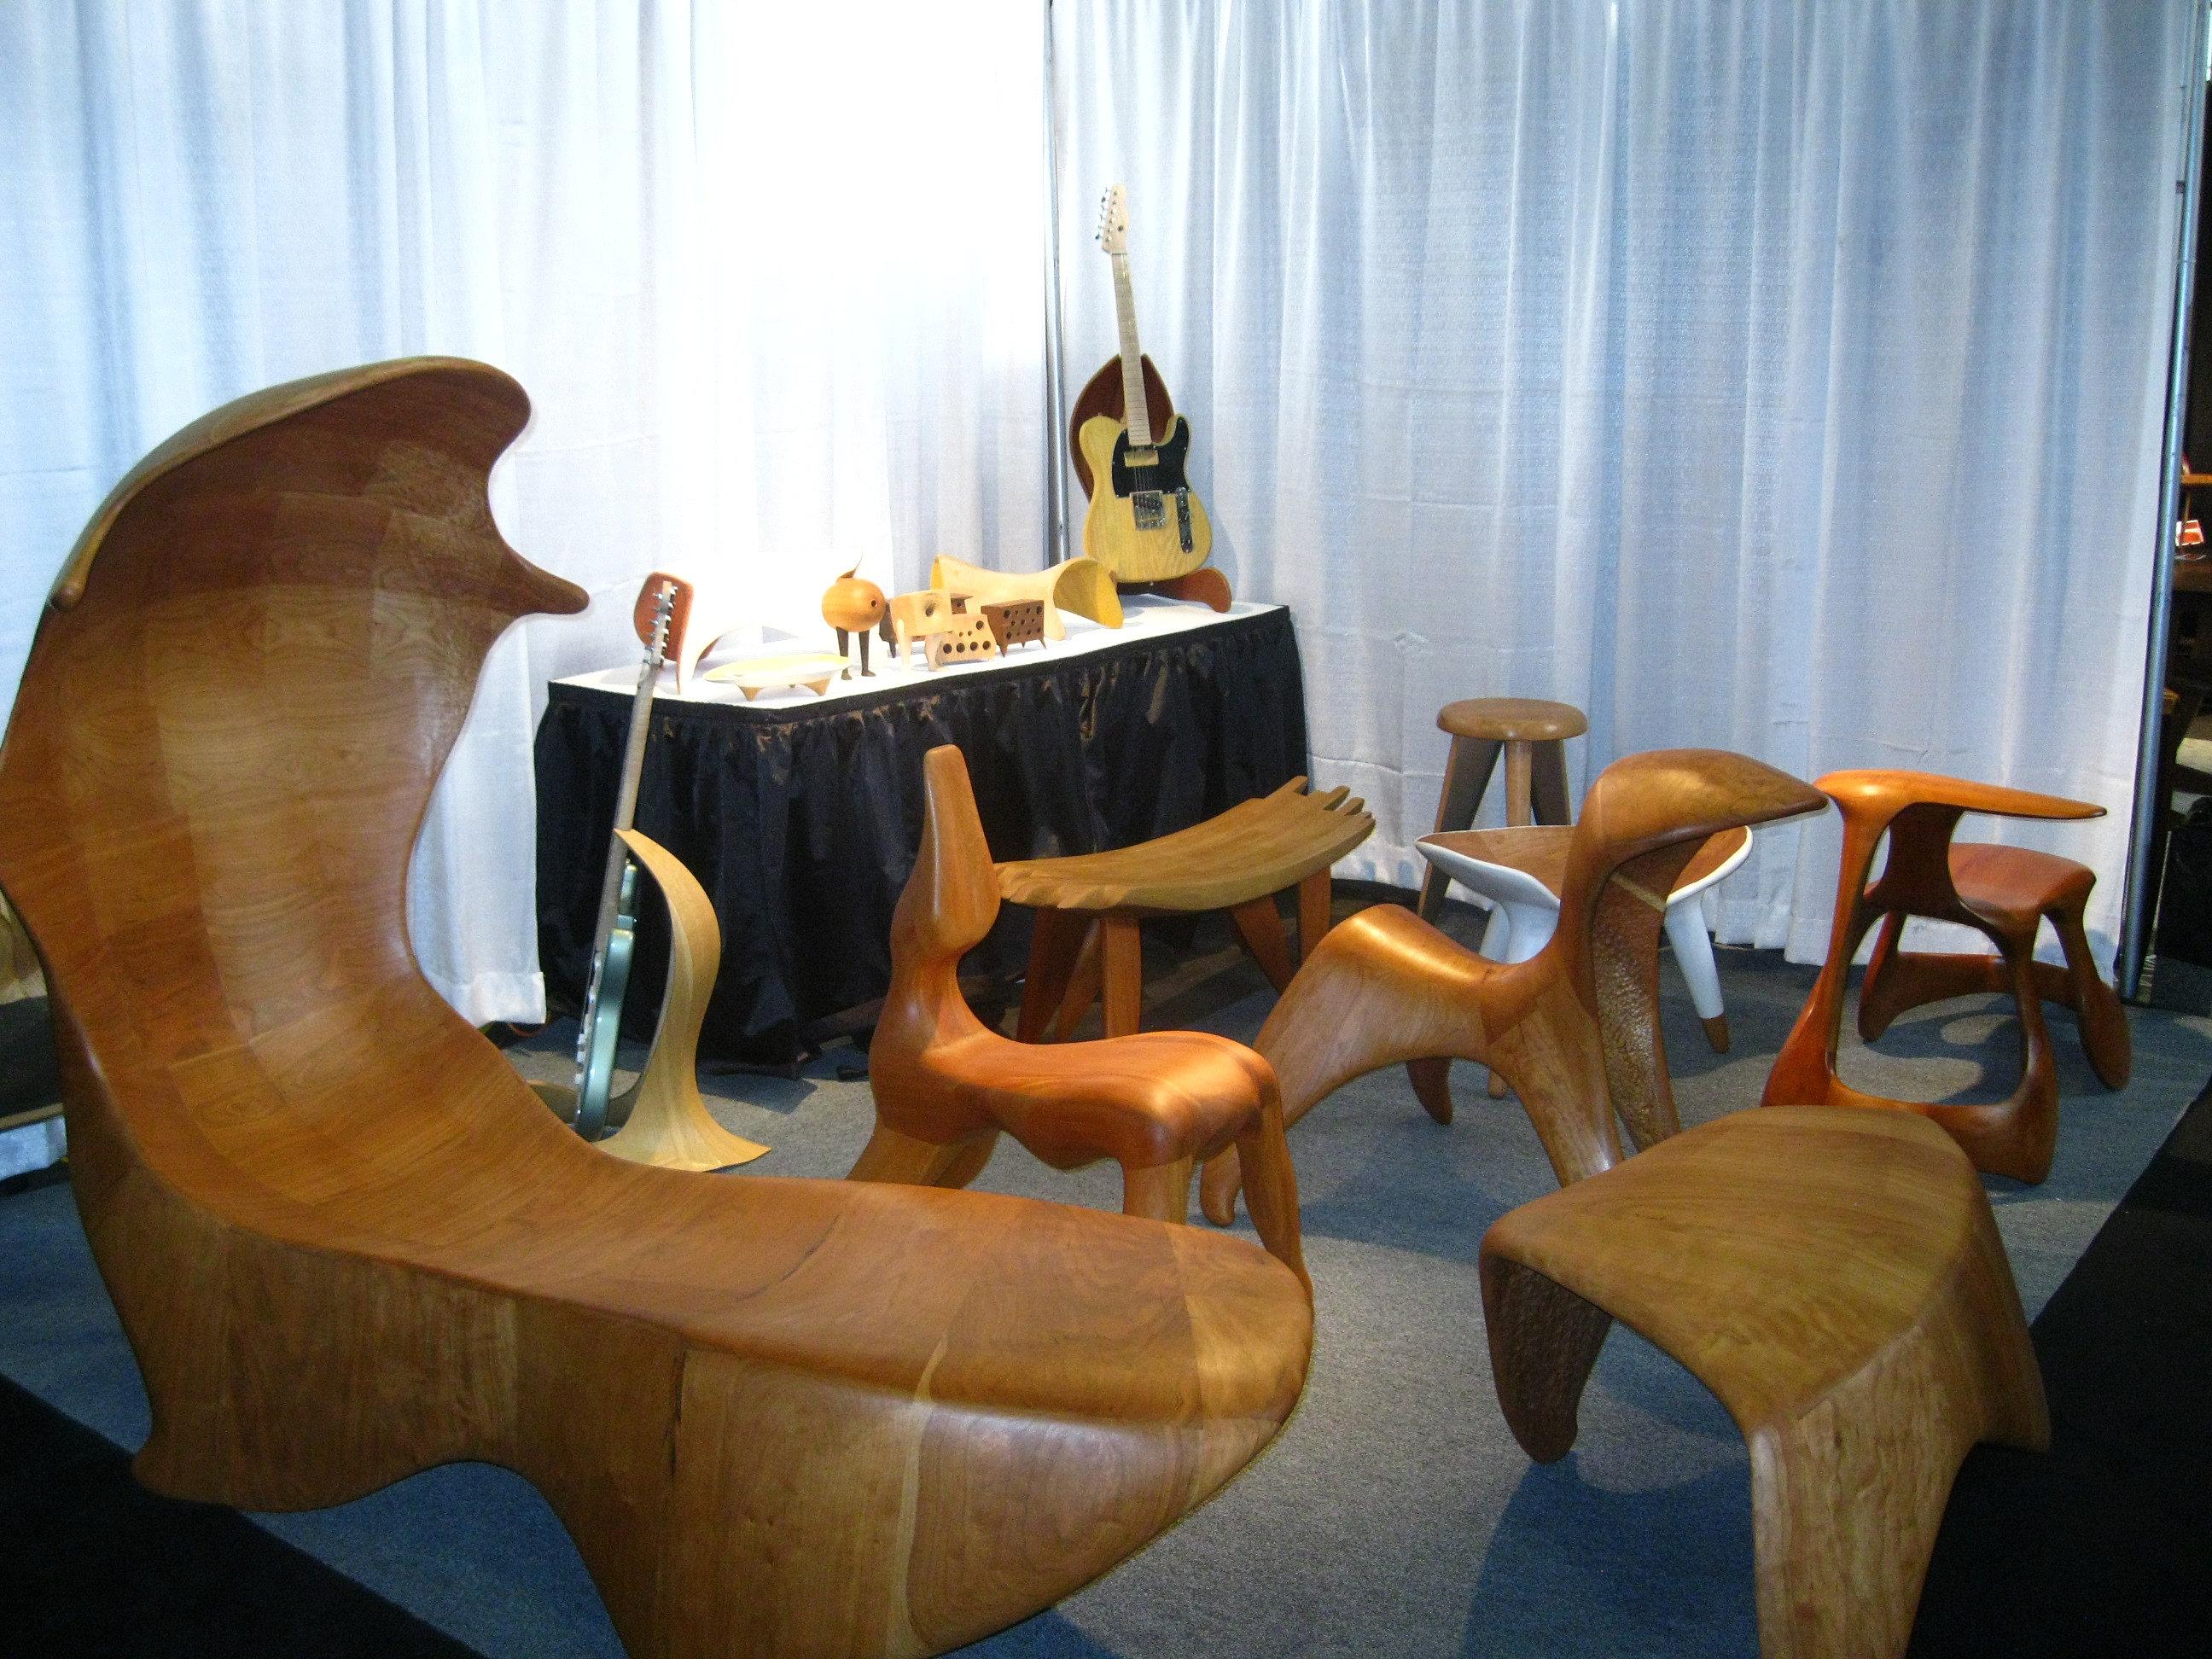 Philadelphia Invitational Furniture Show Img 0707 Jpg